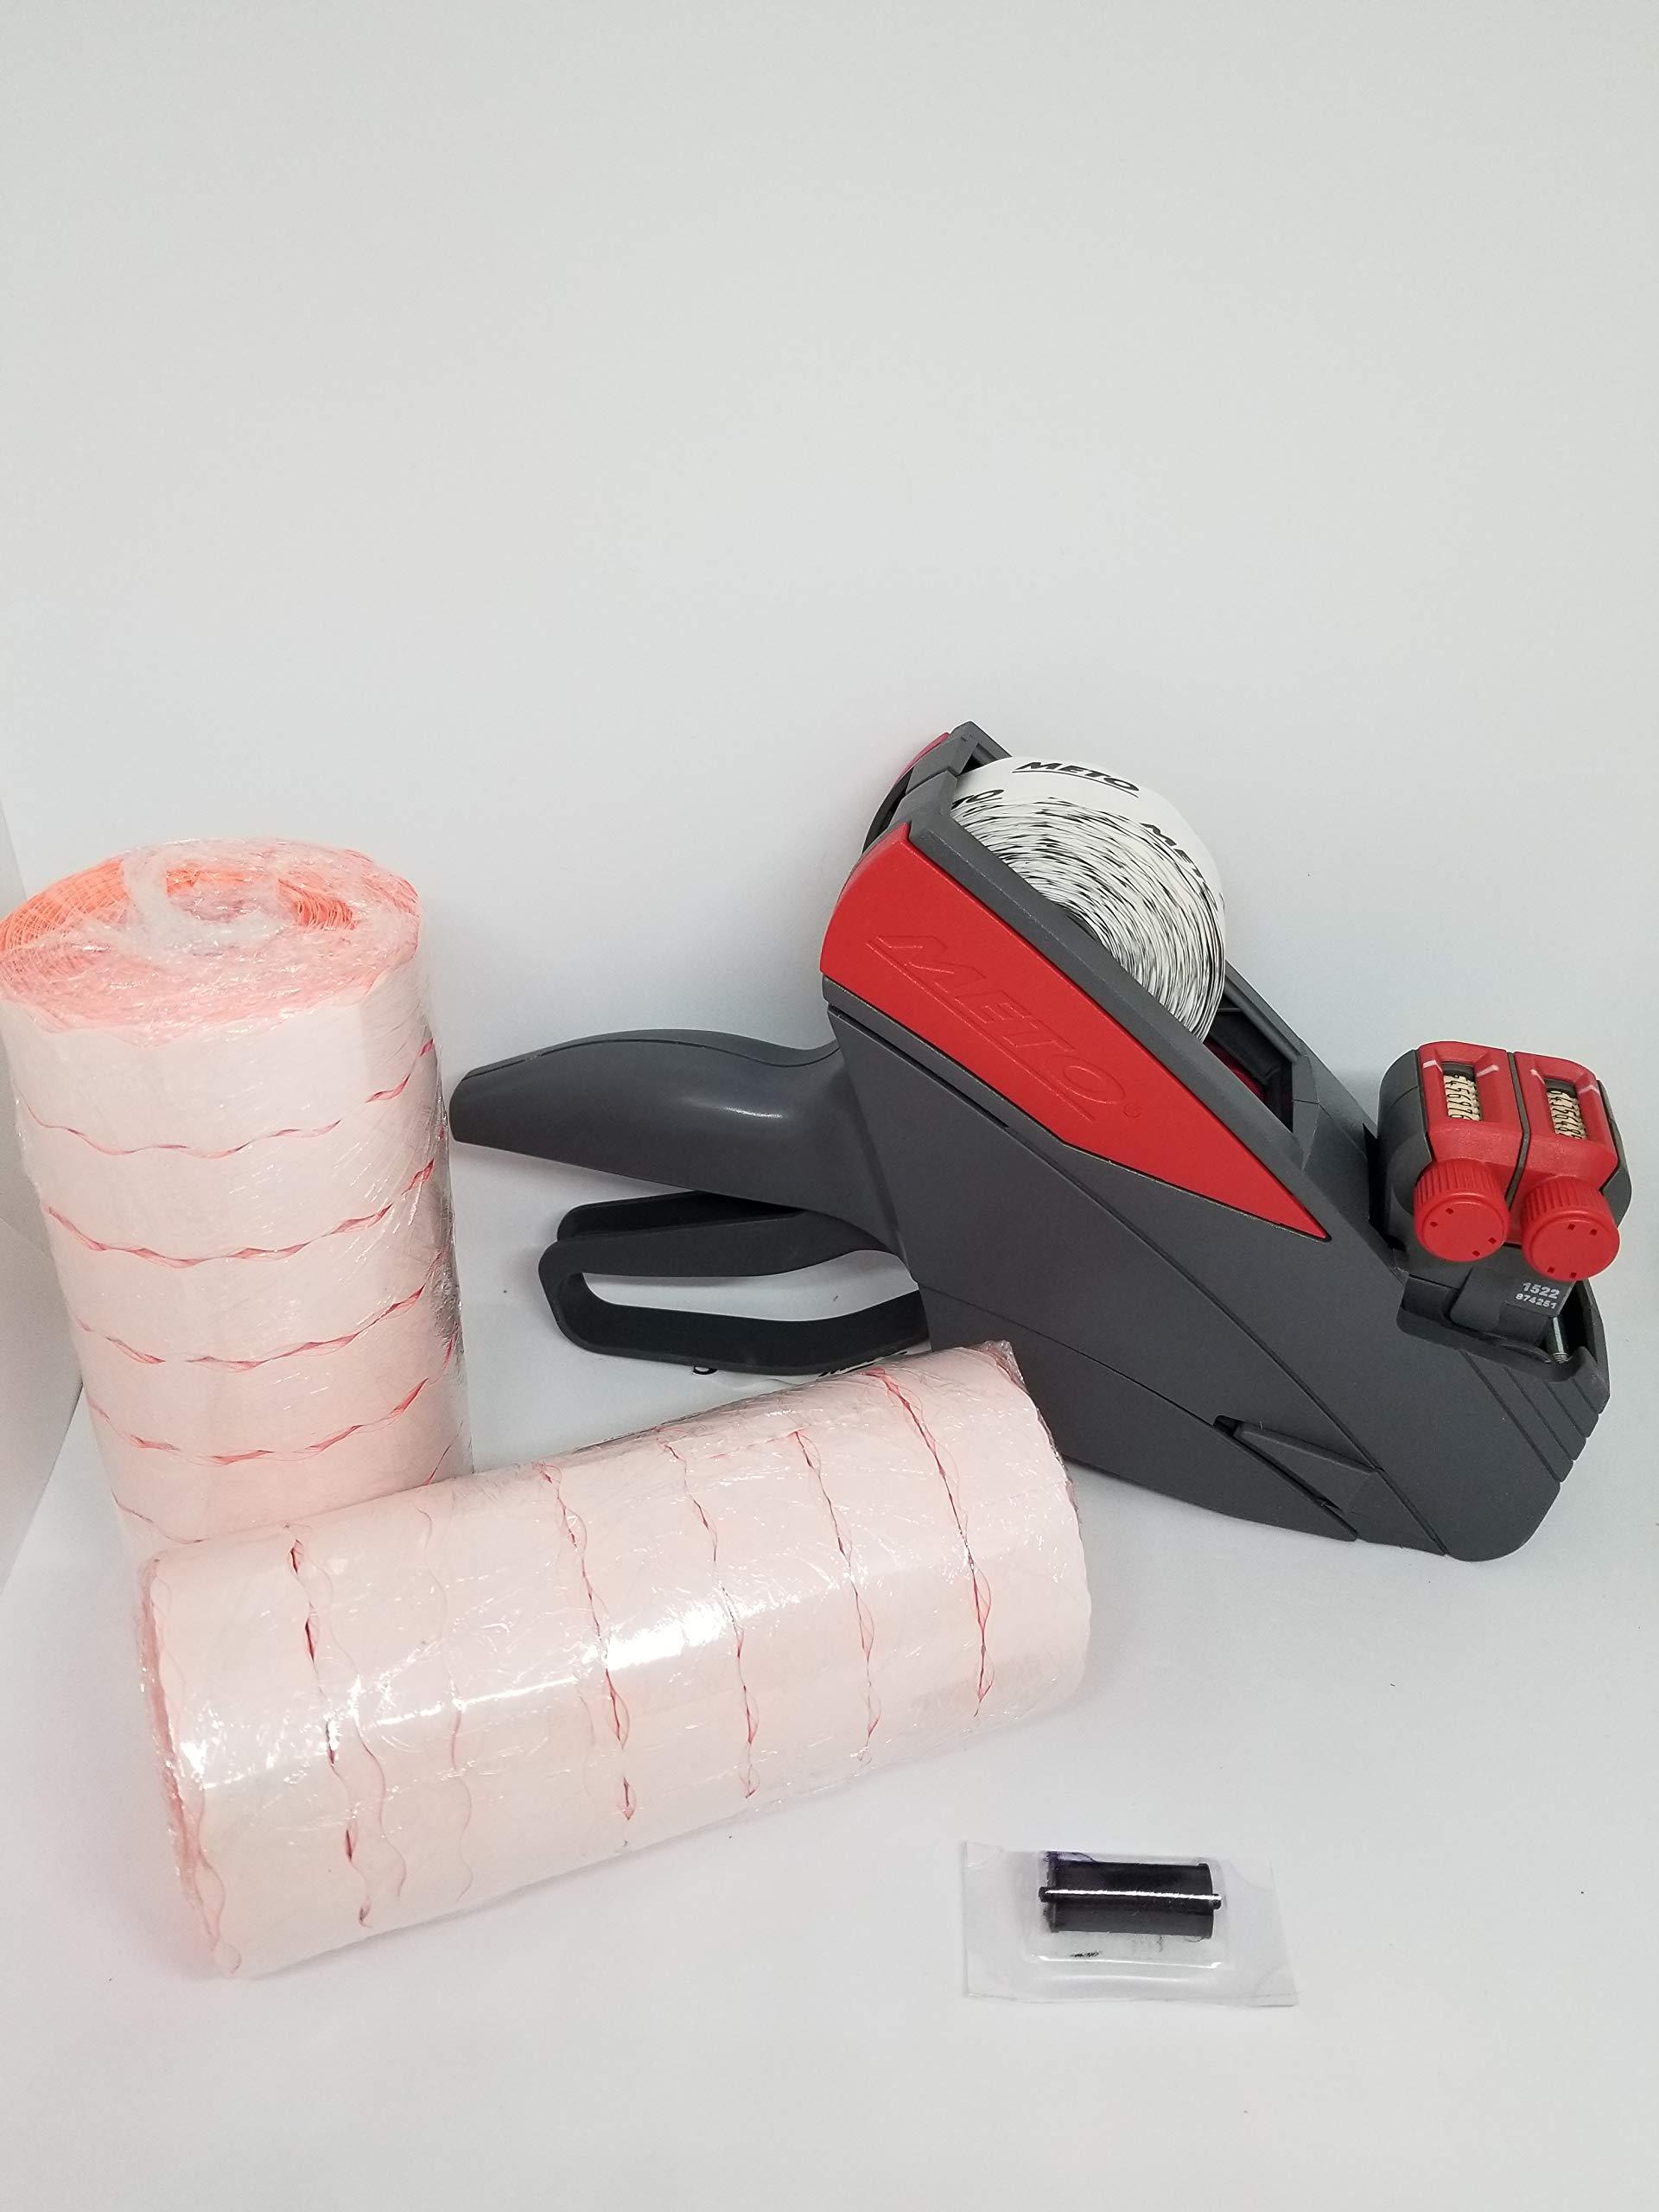 Meto 15.22/2 line Price Labelgun, Value Pack, Price Gun, Box Fluro Red Labels, Ink Roller